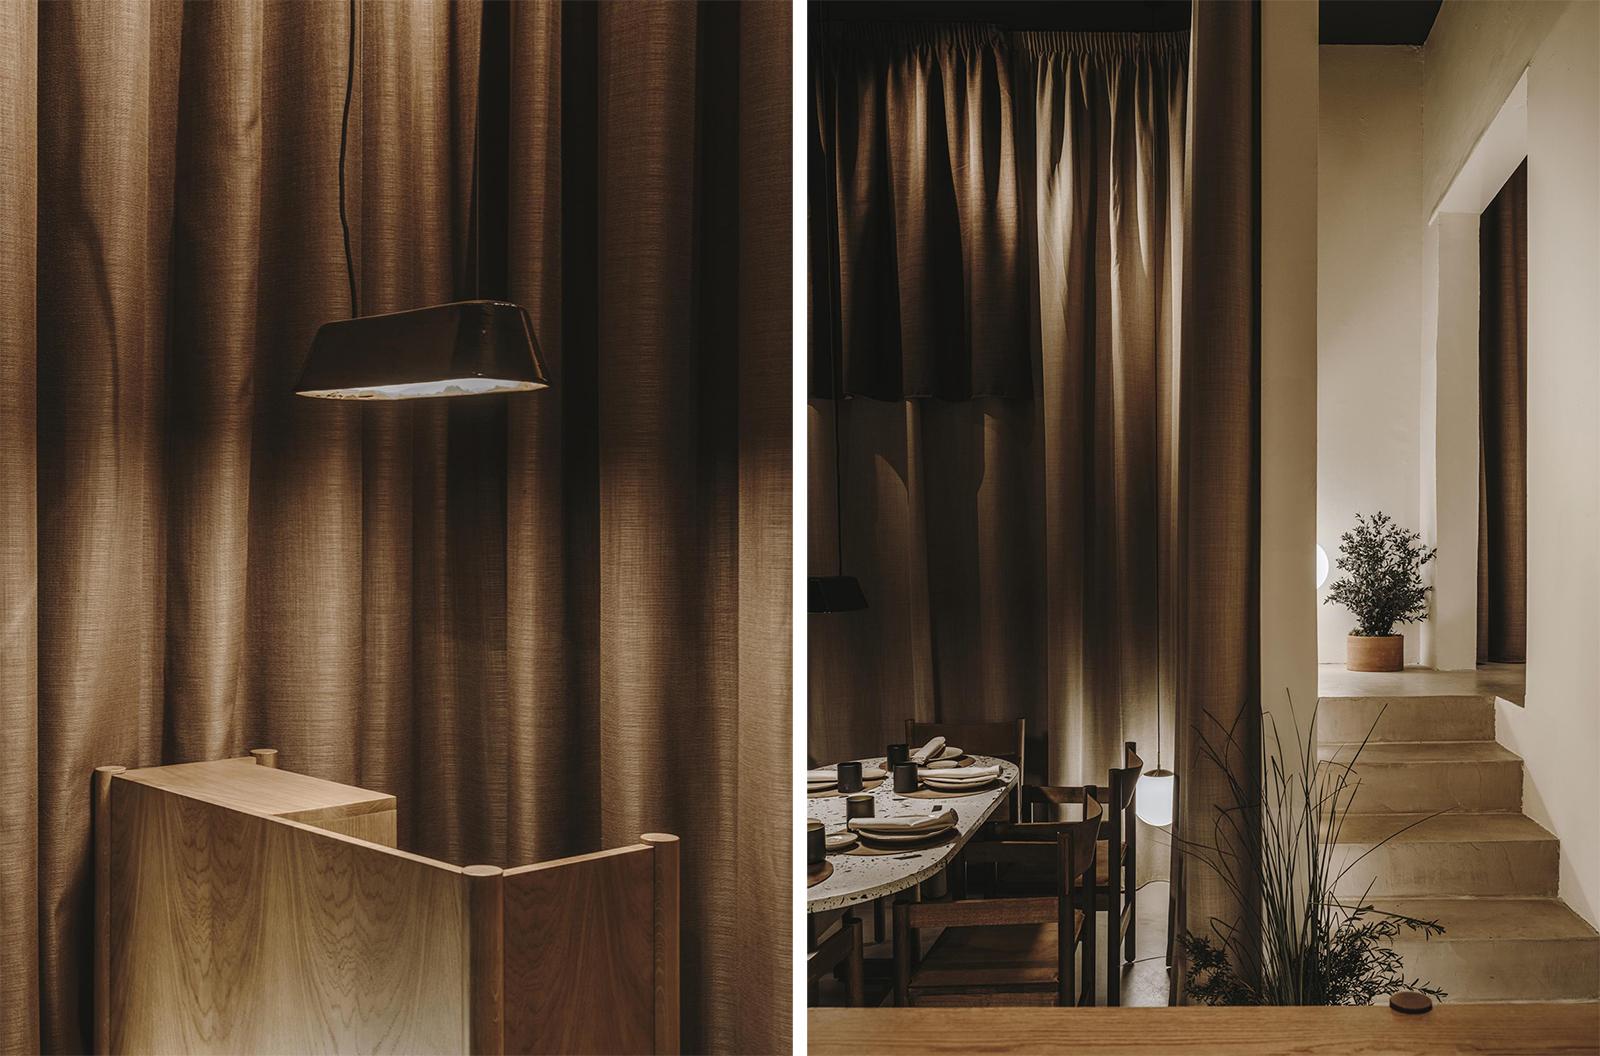 New minimalist interiors of 'Normal' restaurant in Girona, Spain